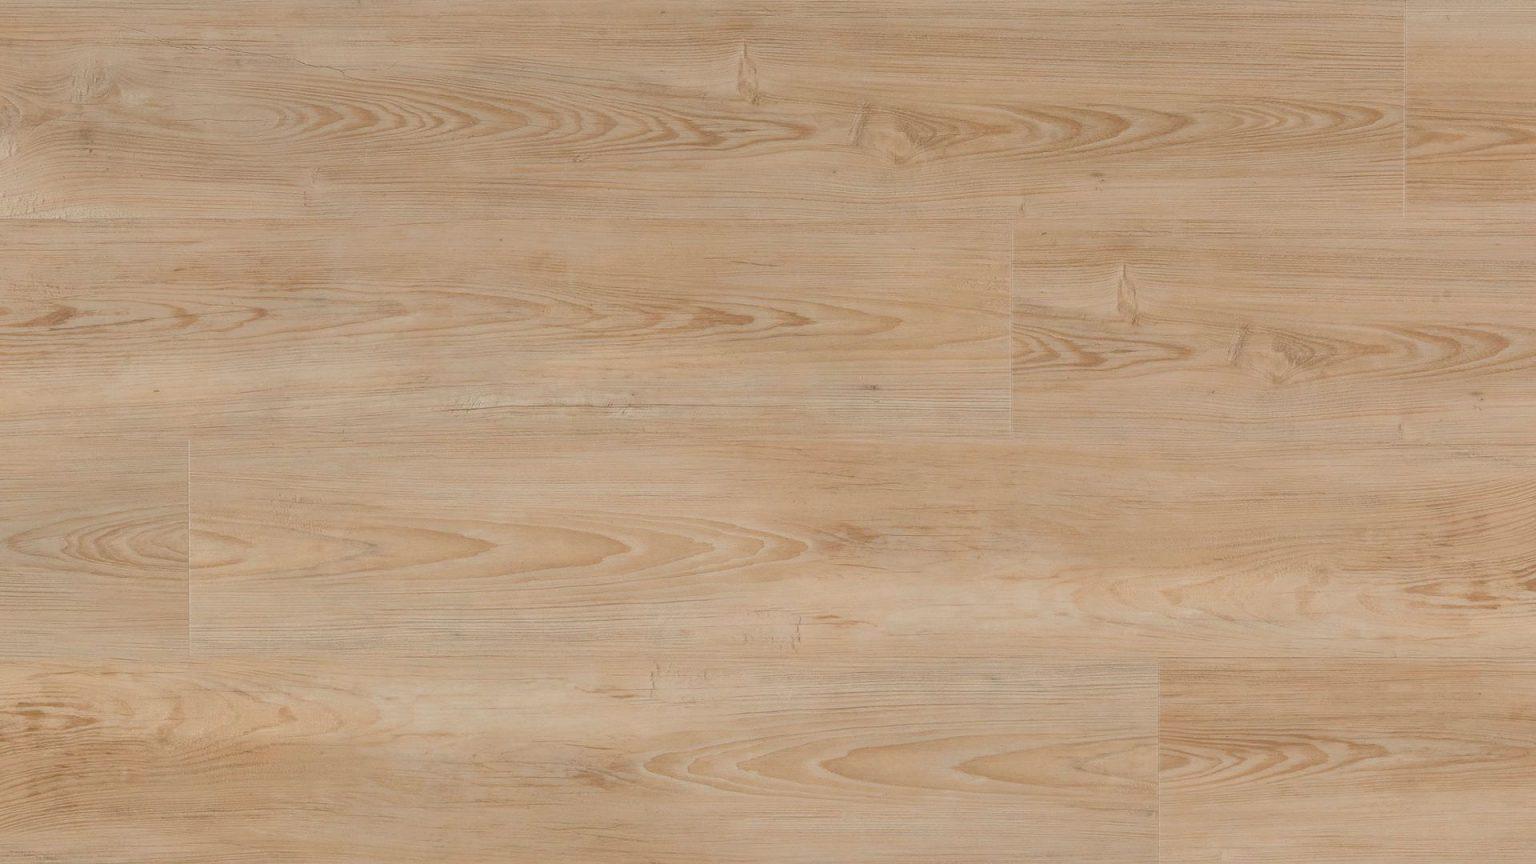 Huron 50 LVRE 125 / COREtec® authentics wood